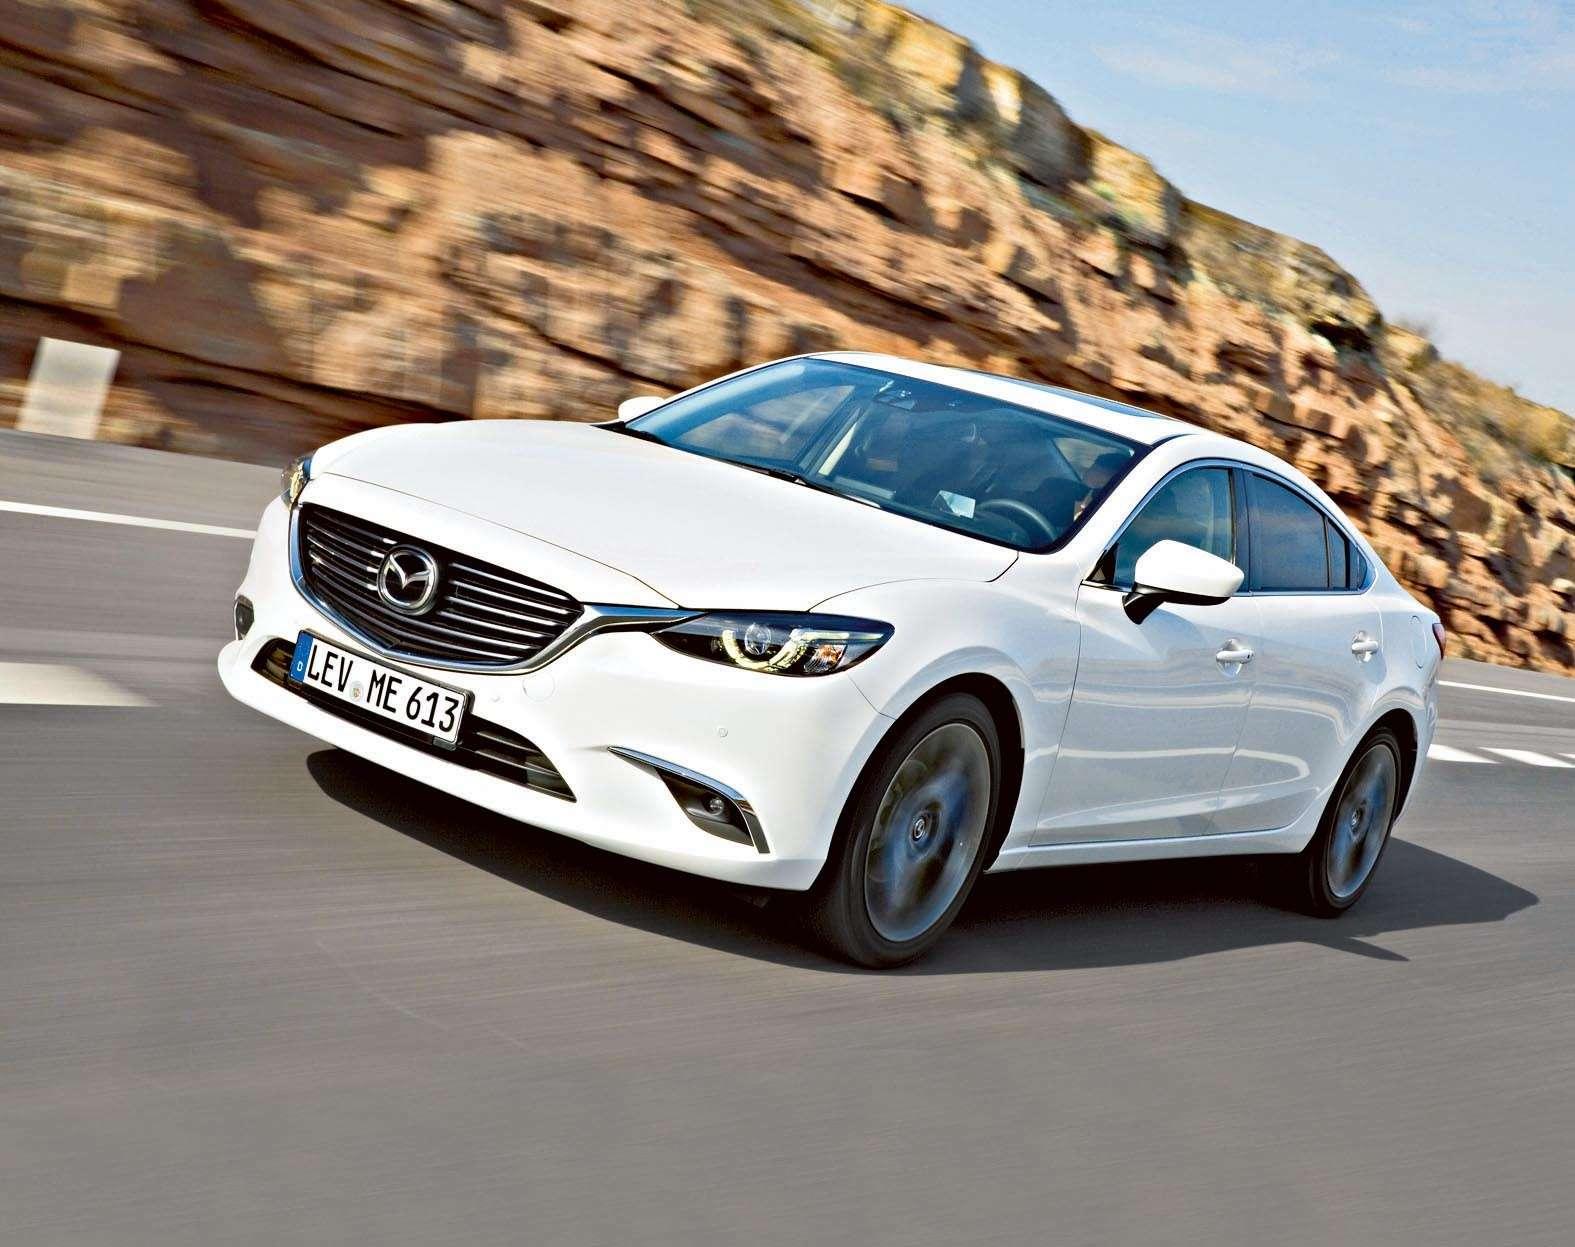 2015_Mazda6_action_24_SDN__jpg300